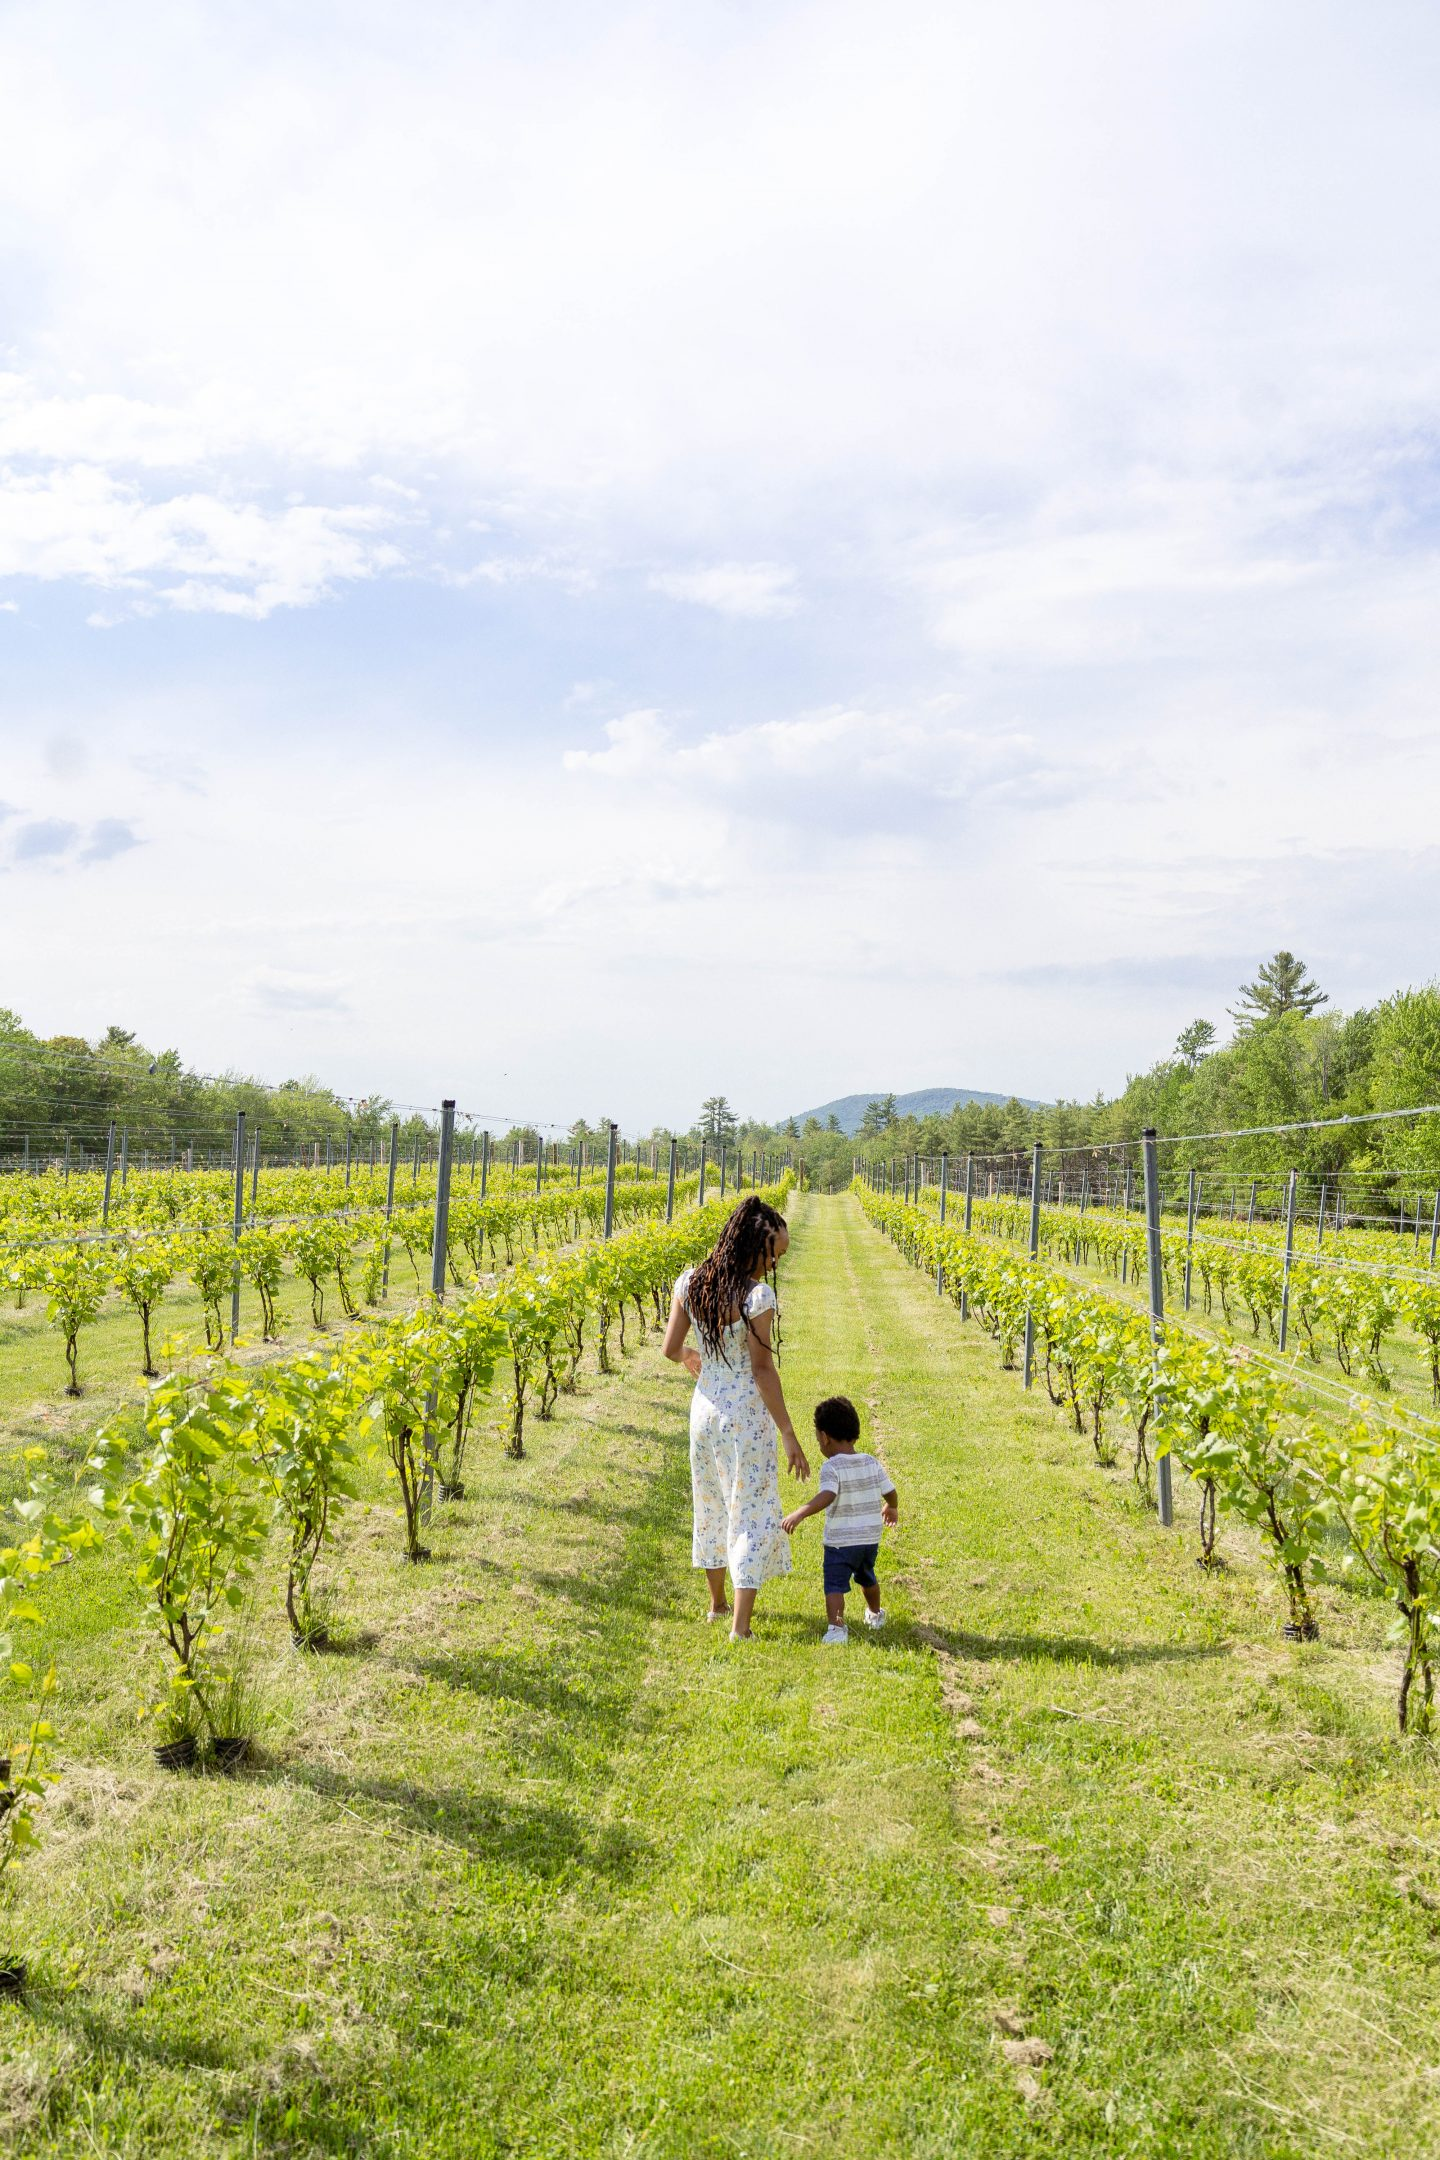 livinglesh cellardoor winery vineyard